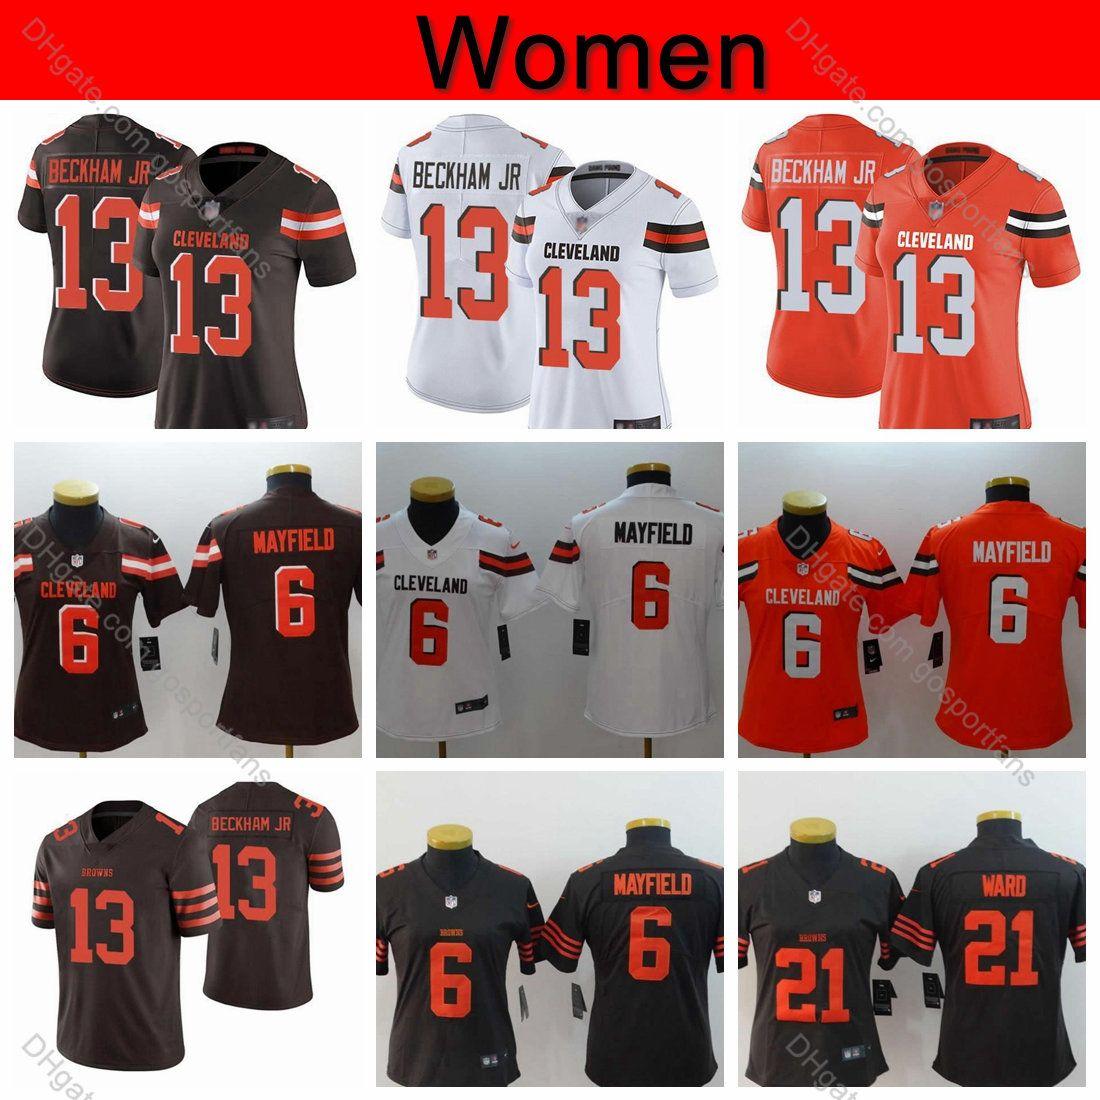 newest 0109a 0ef11 Womens Browns 13 Odell Beckham Jr. Jersey 6 Baker Mayfield Jerseys 21  Denzel Ward Cleveland Ladies Football Jerseys Girls Stitched S-XXL